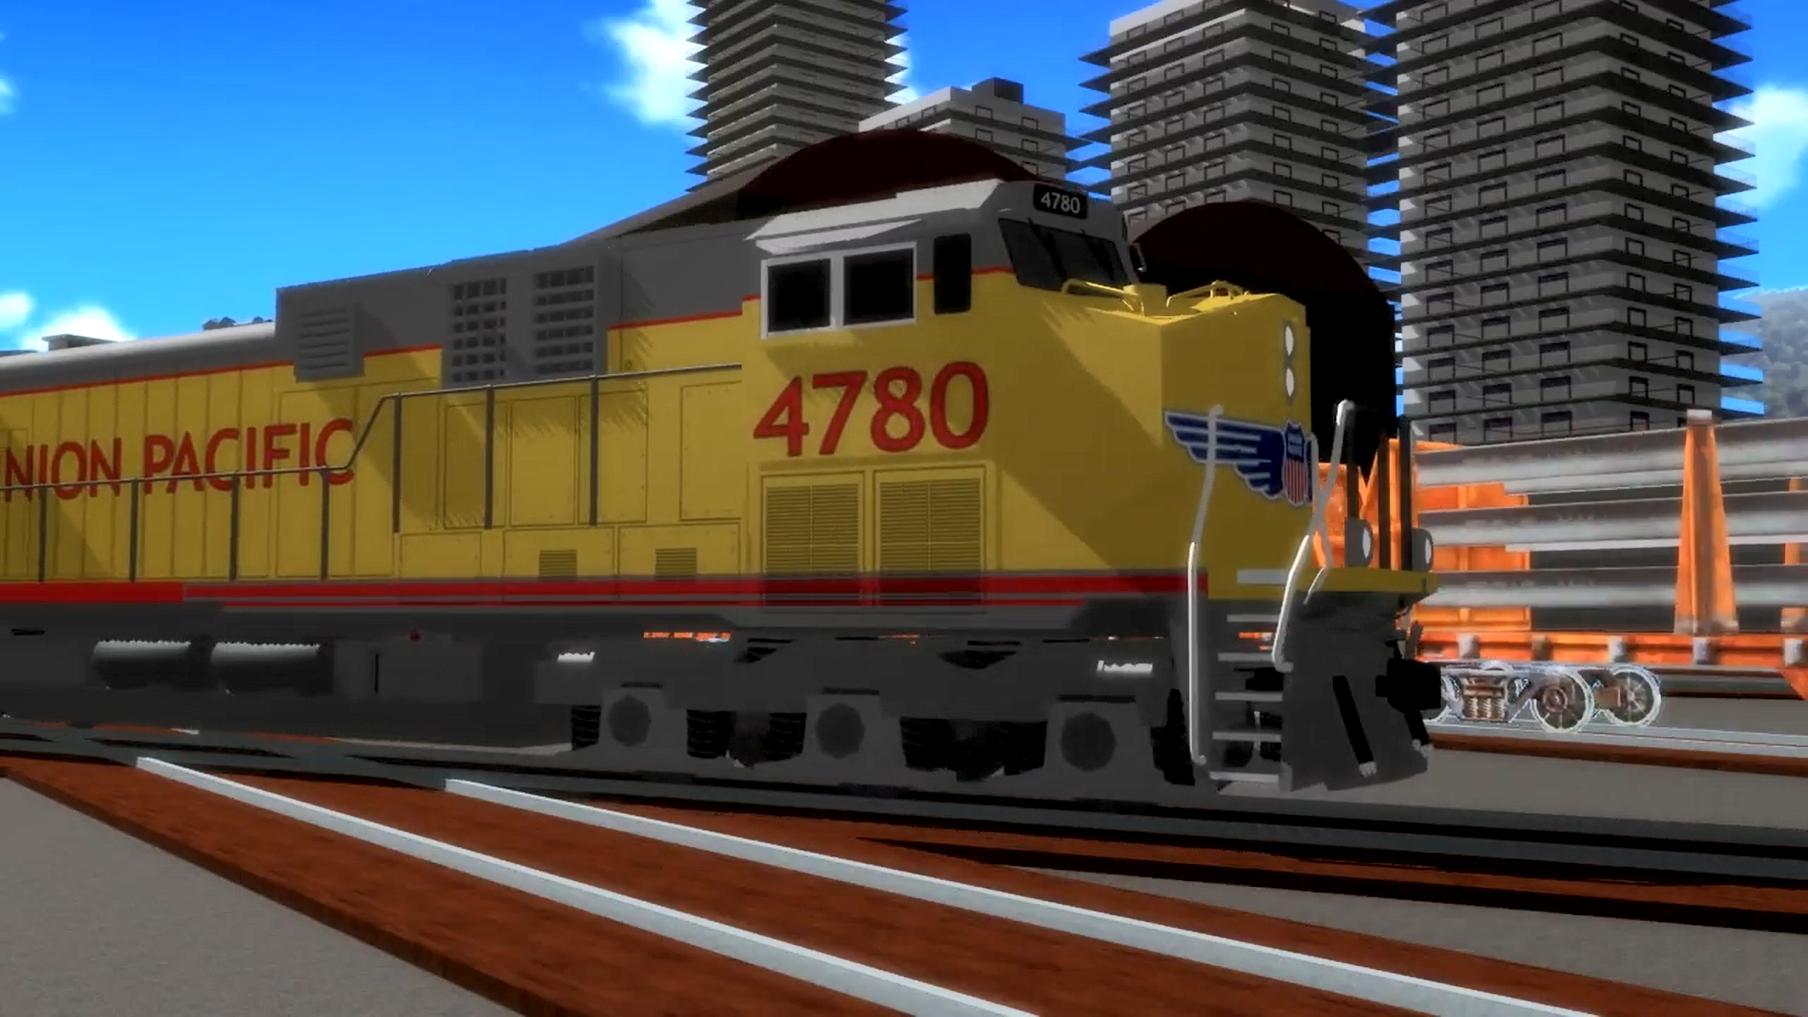 Minor Faceless Diesel Engines